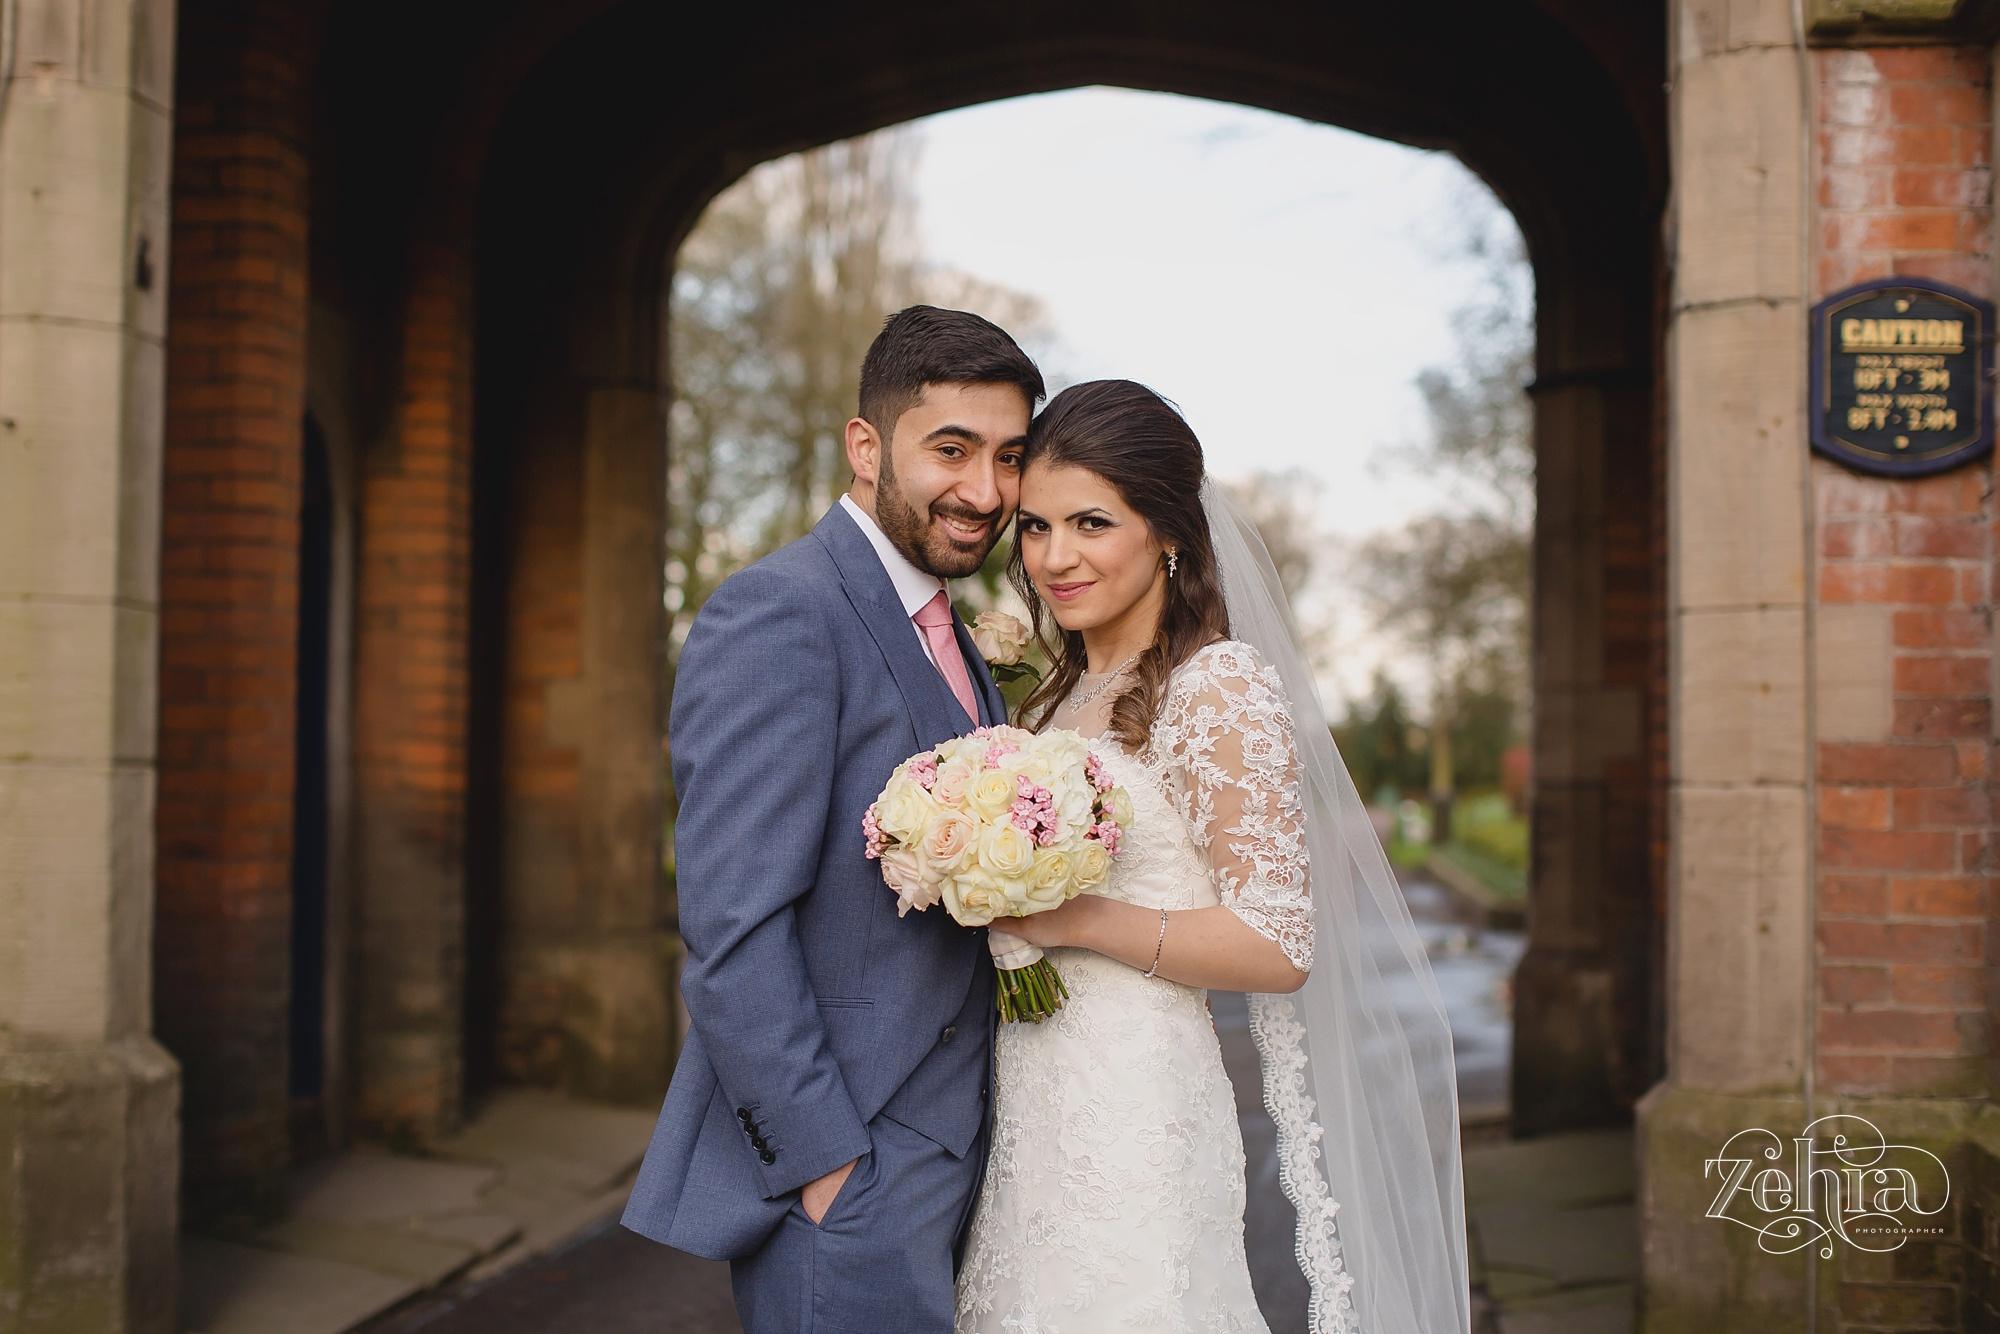 zehra photographer mere cheshire wedding_0025.jpg